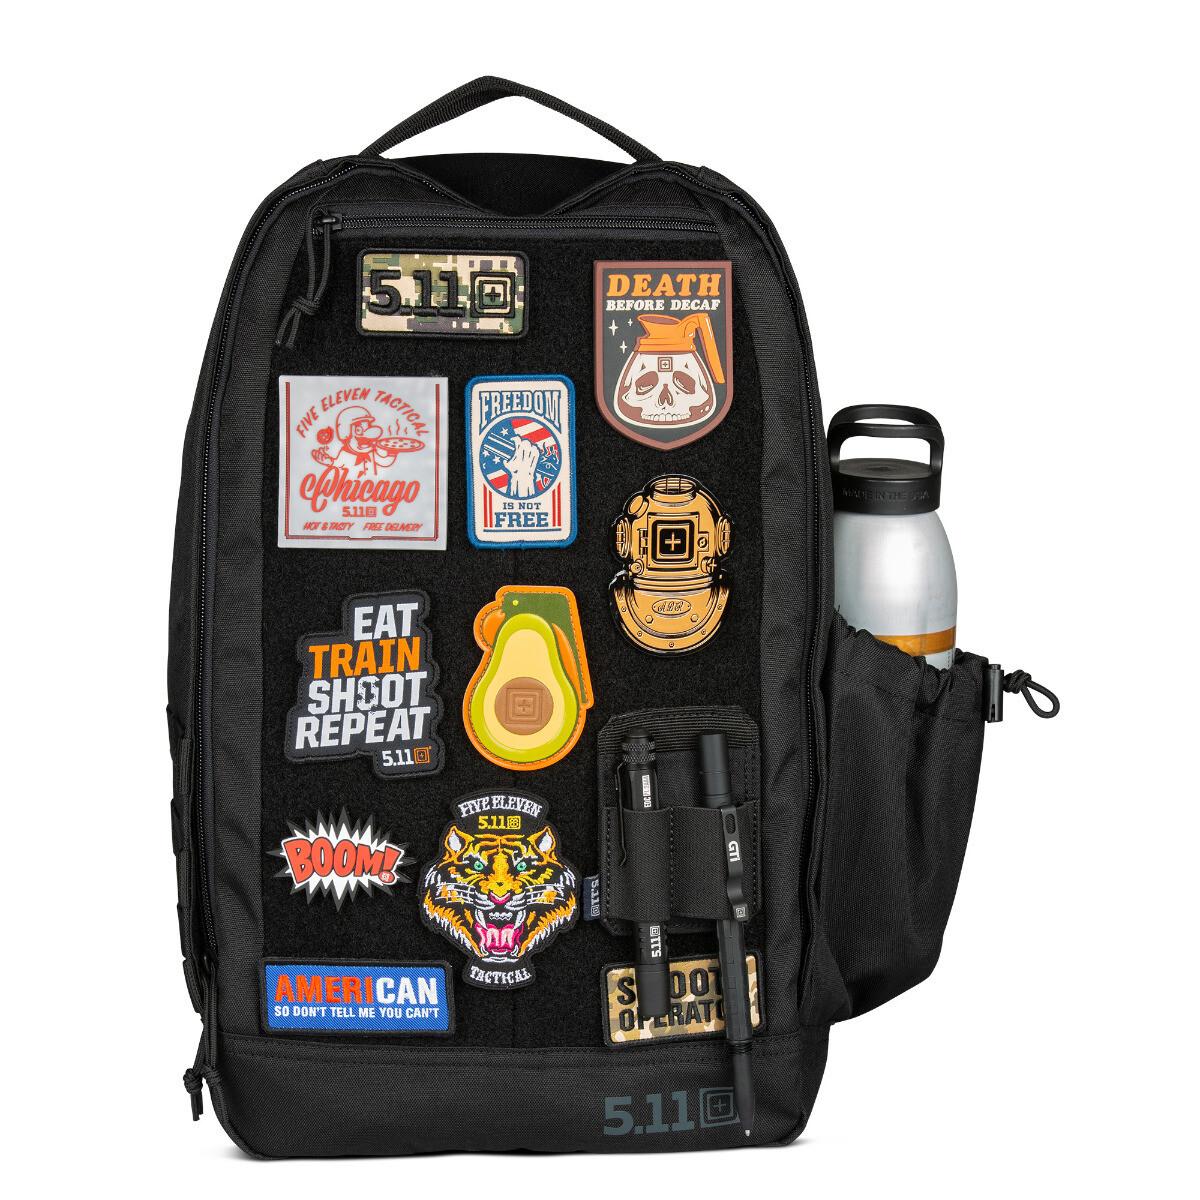 5.11 Tactical - Morale Pack (20L)